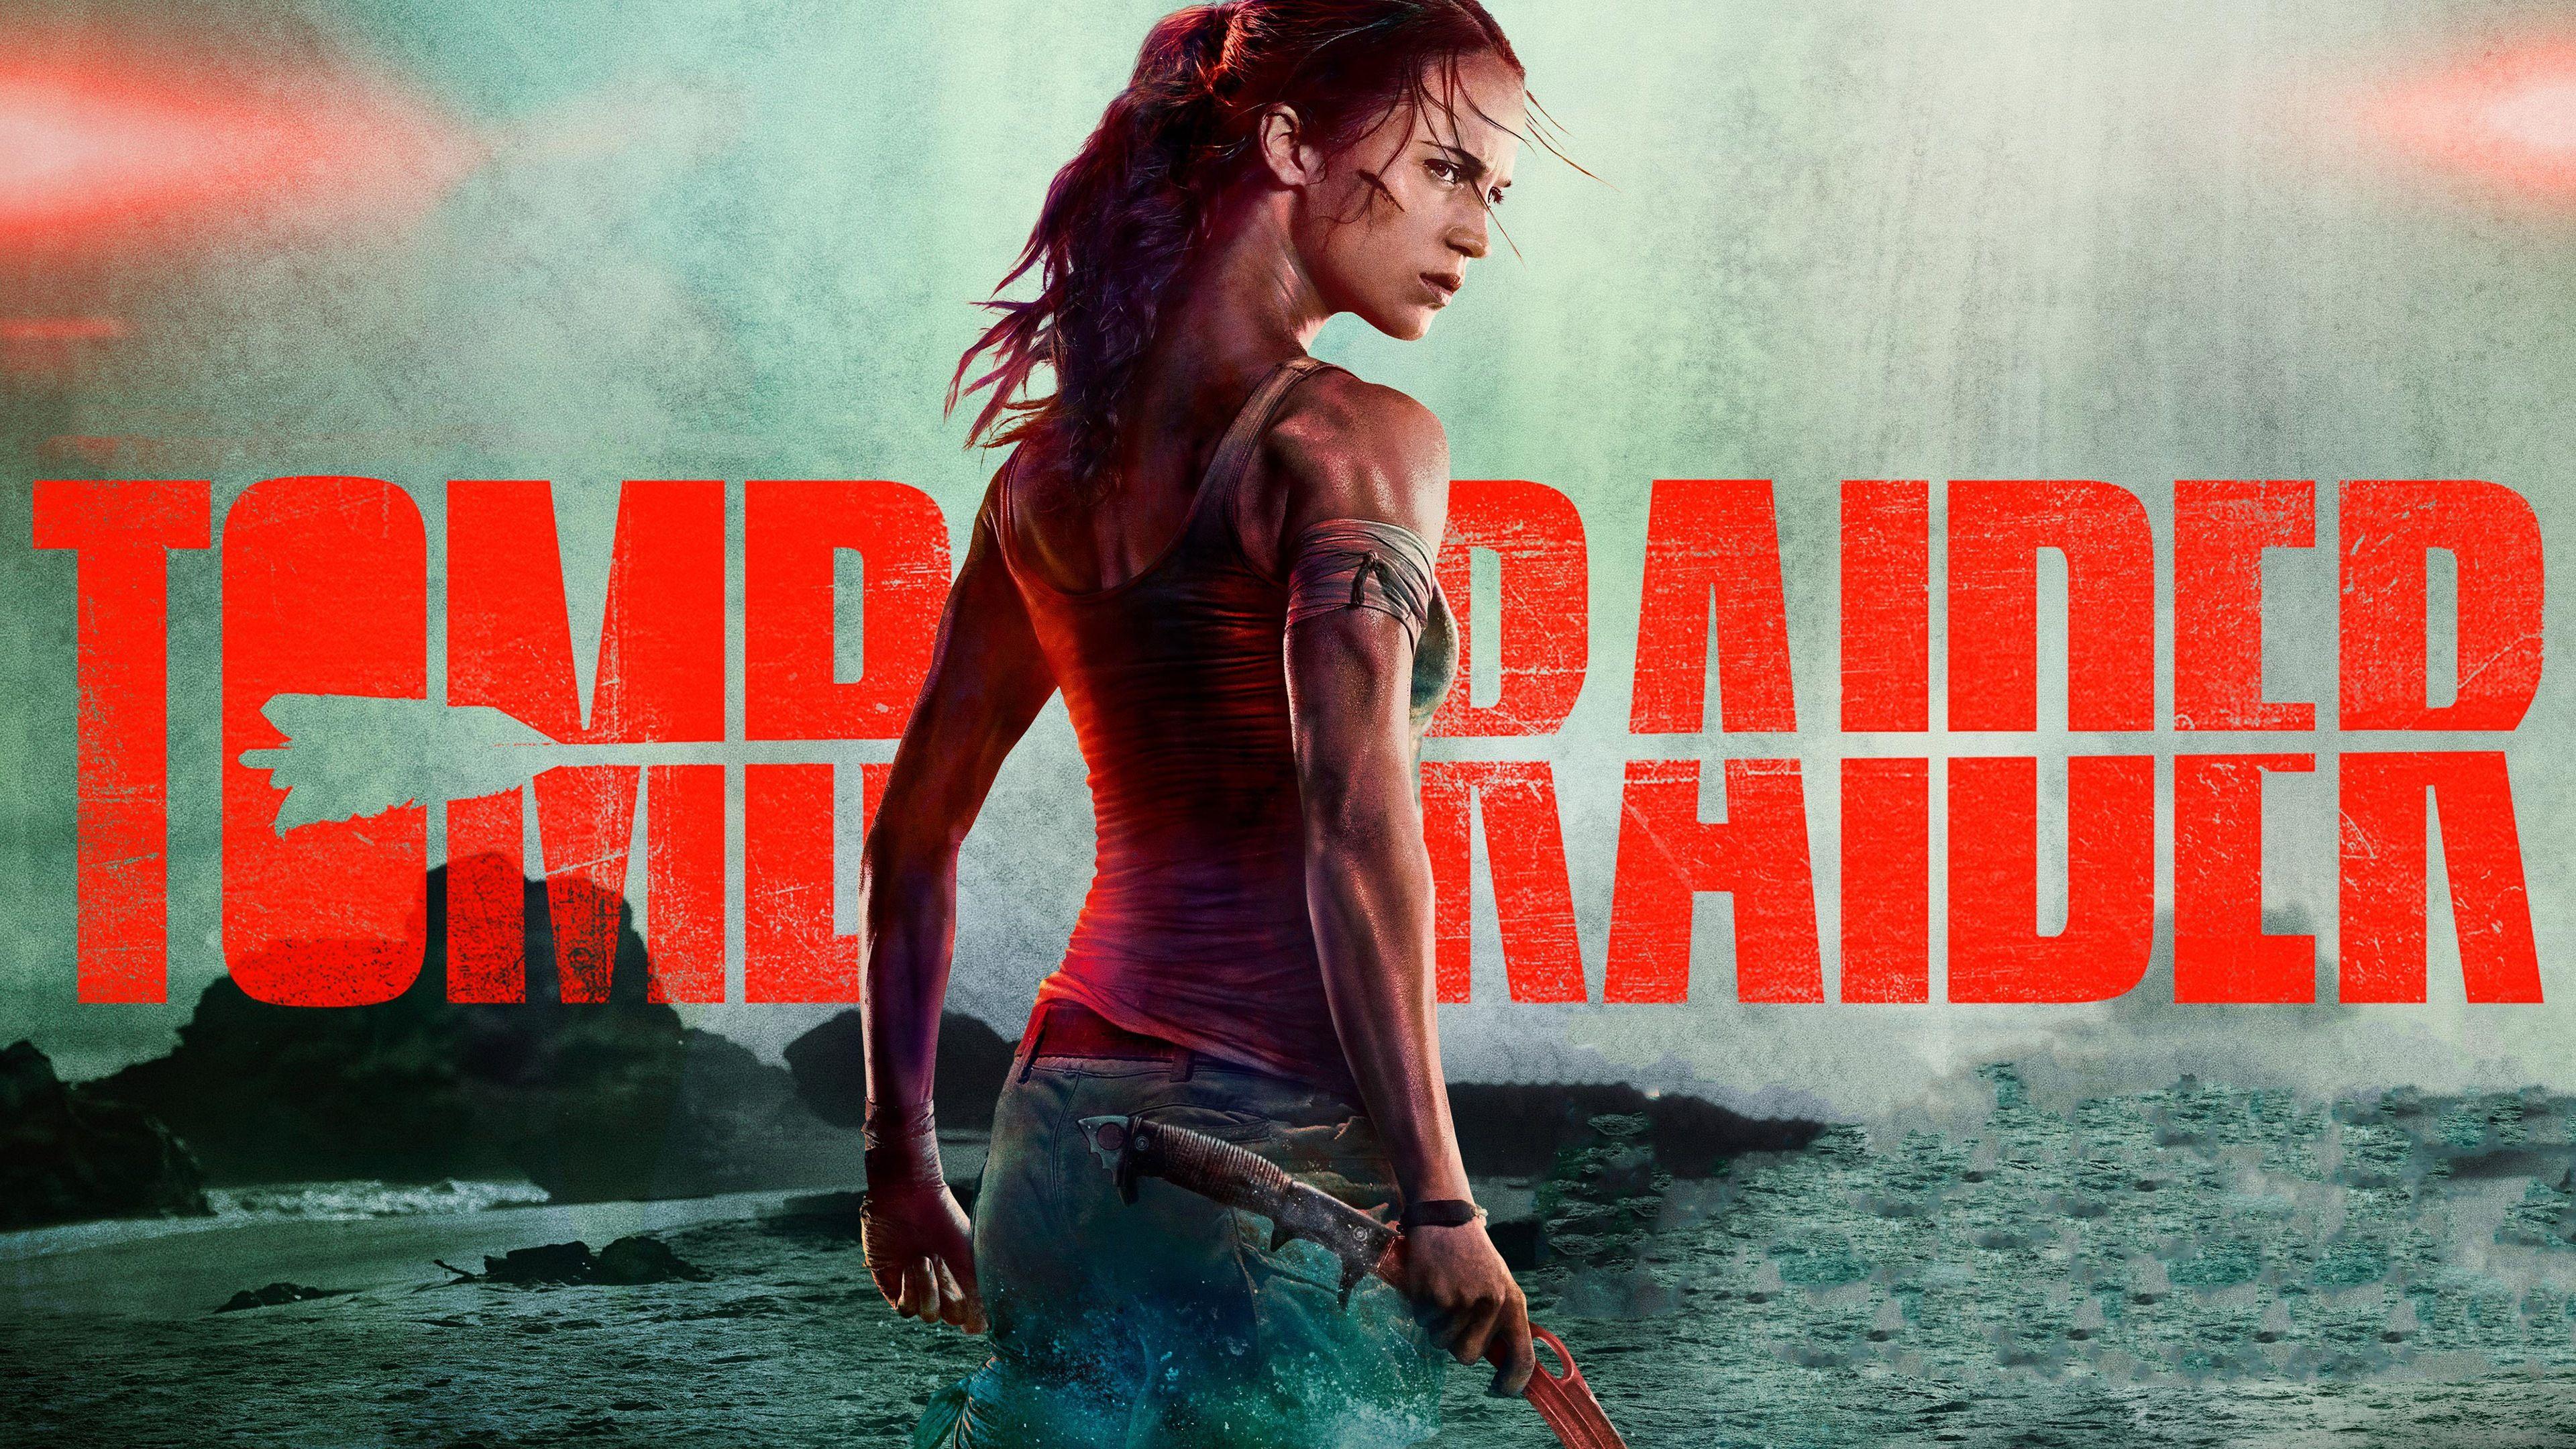 Tomb Raider 2018 Wallpapers Wallpaper Cave